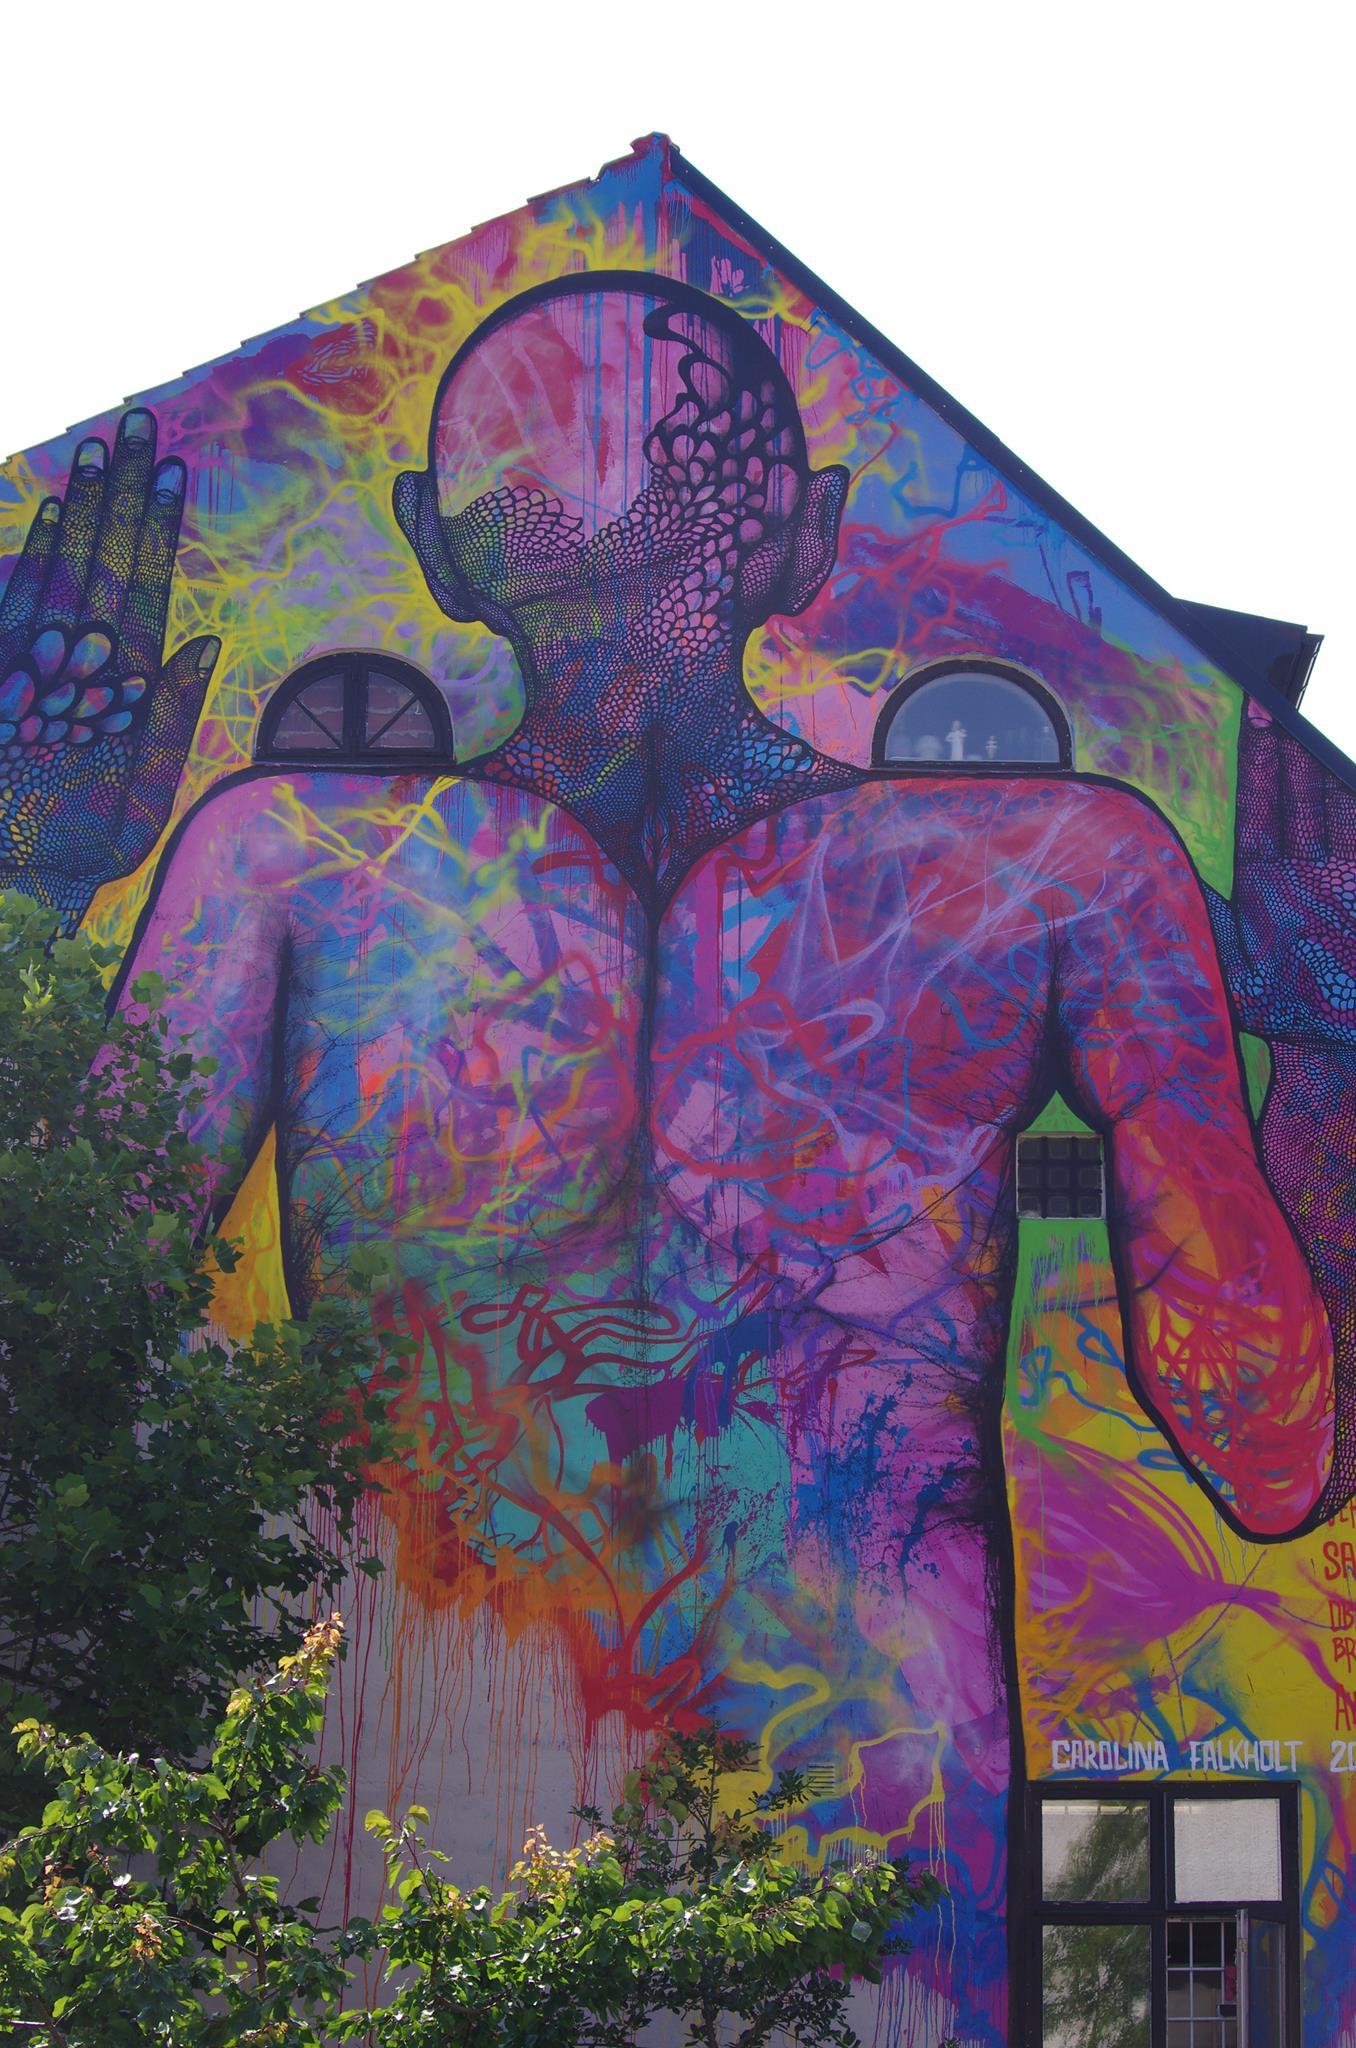 Street Art by Carolina Falkholt at Österlen, Sweden 2014 2